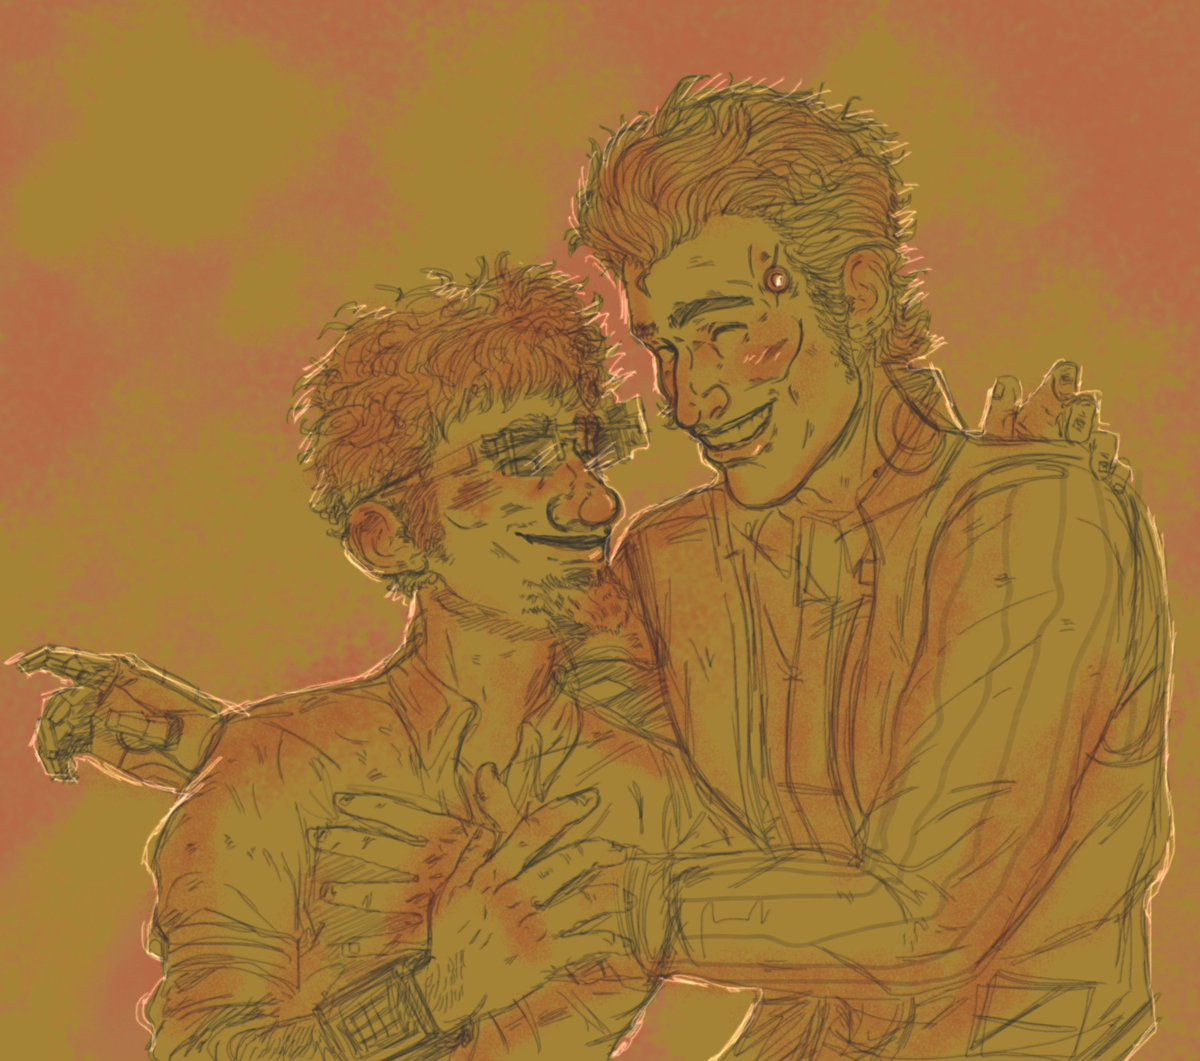 #borderlands3 gayperion moments <br>http://pic.twitter.com/72eS4bZOrS